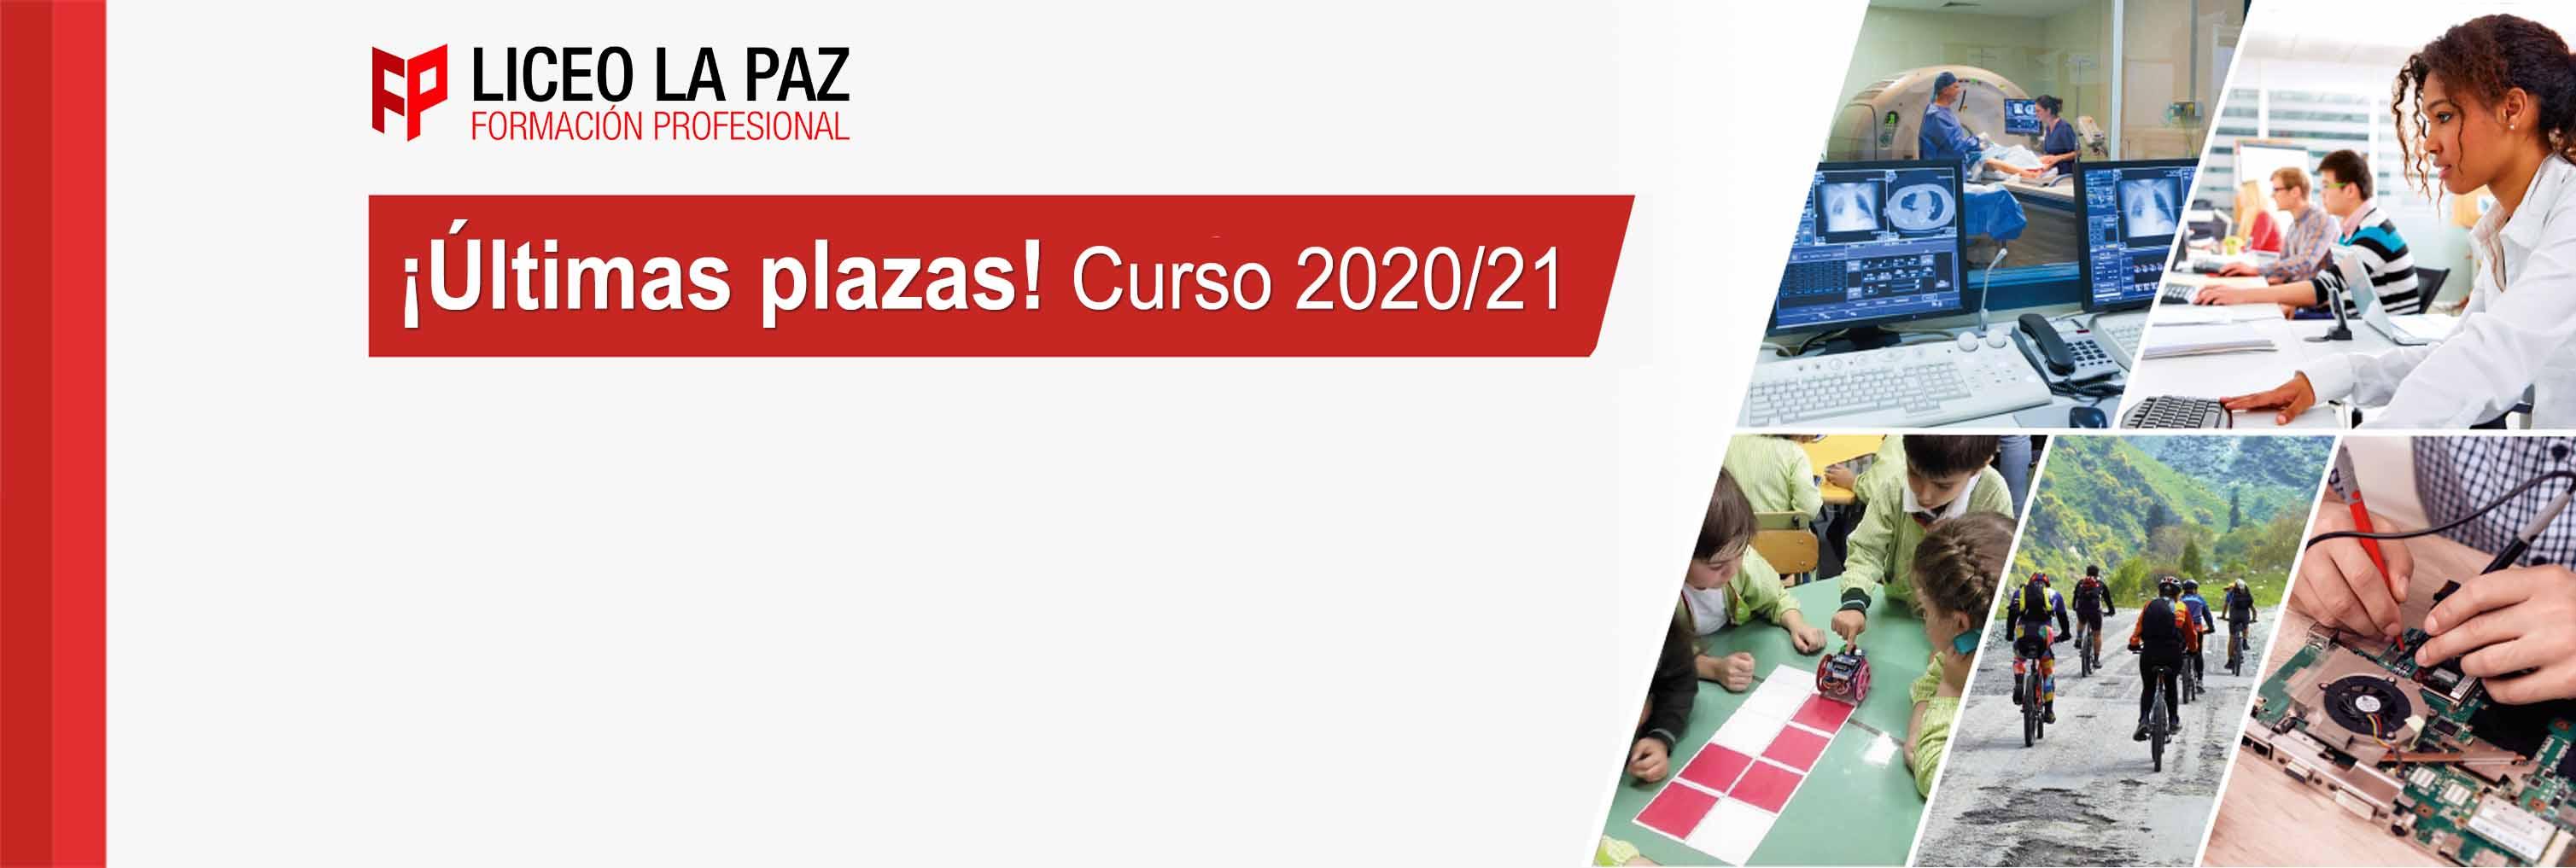 slide-web-liceo-ultimas-plazas